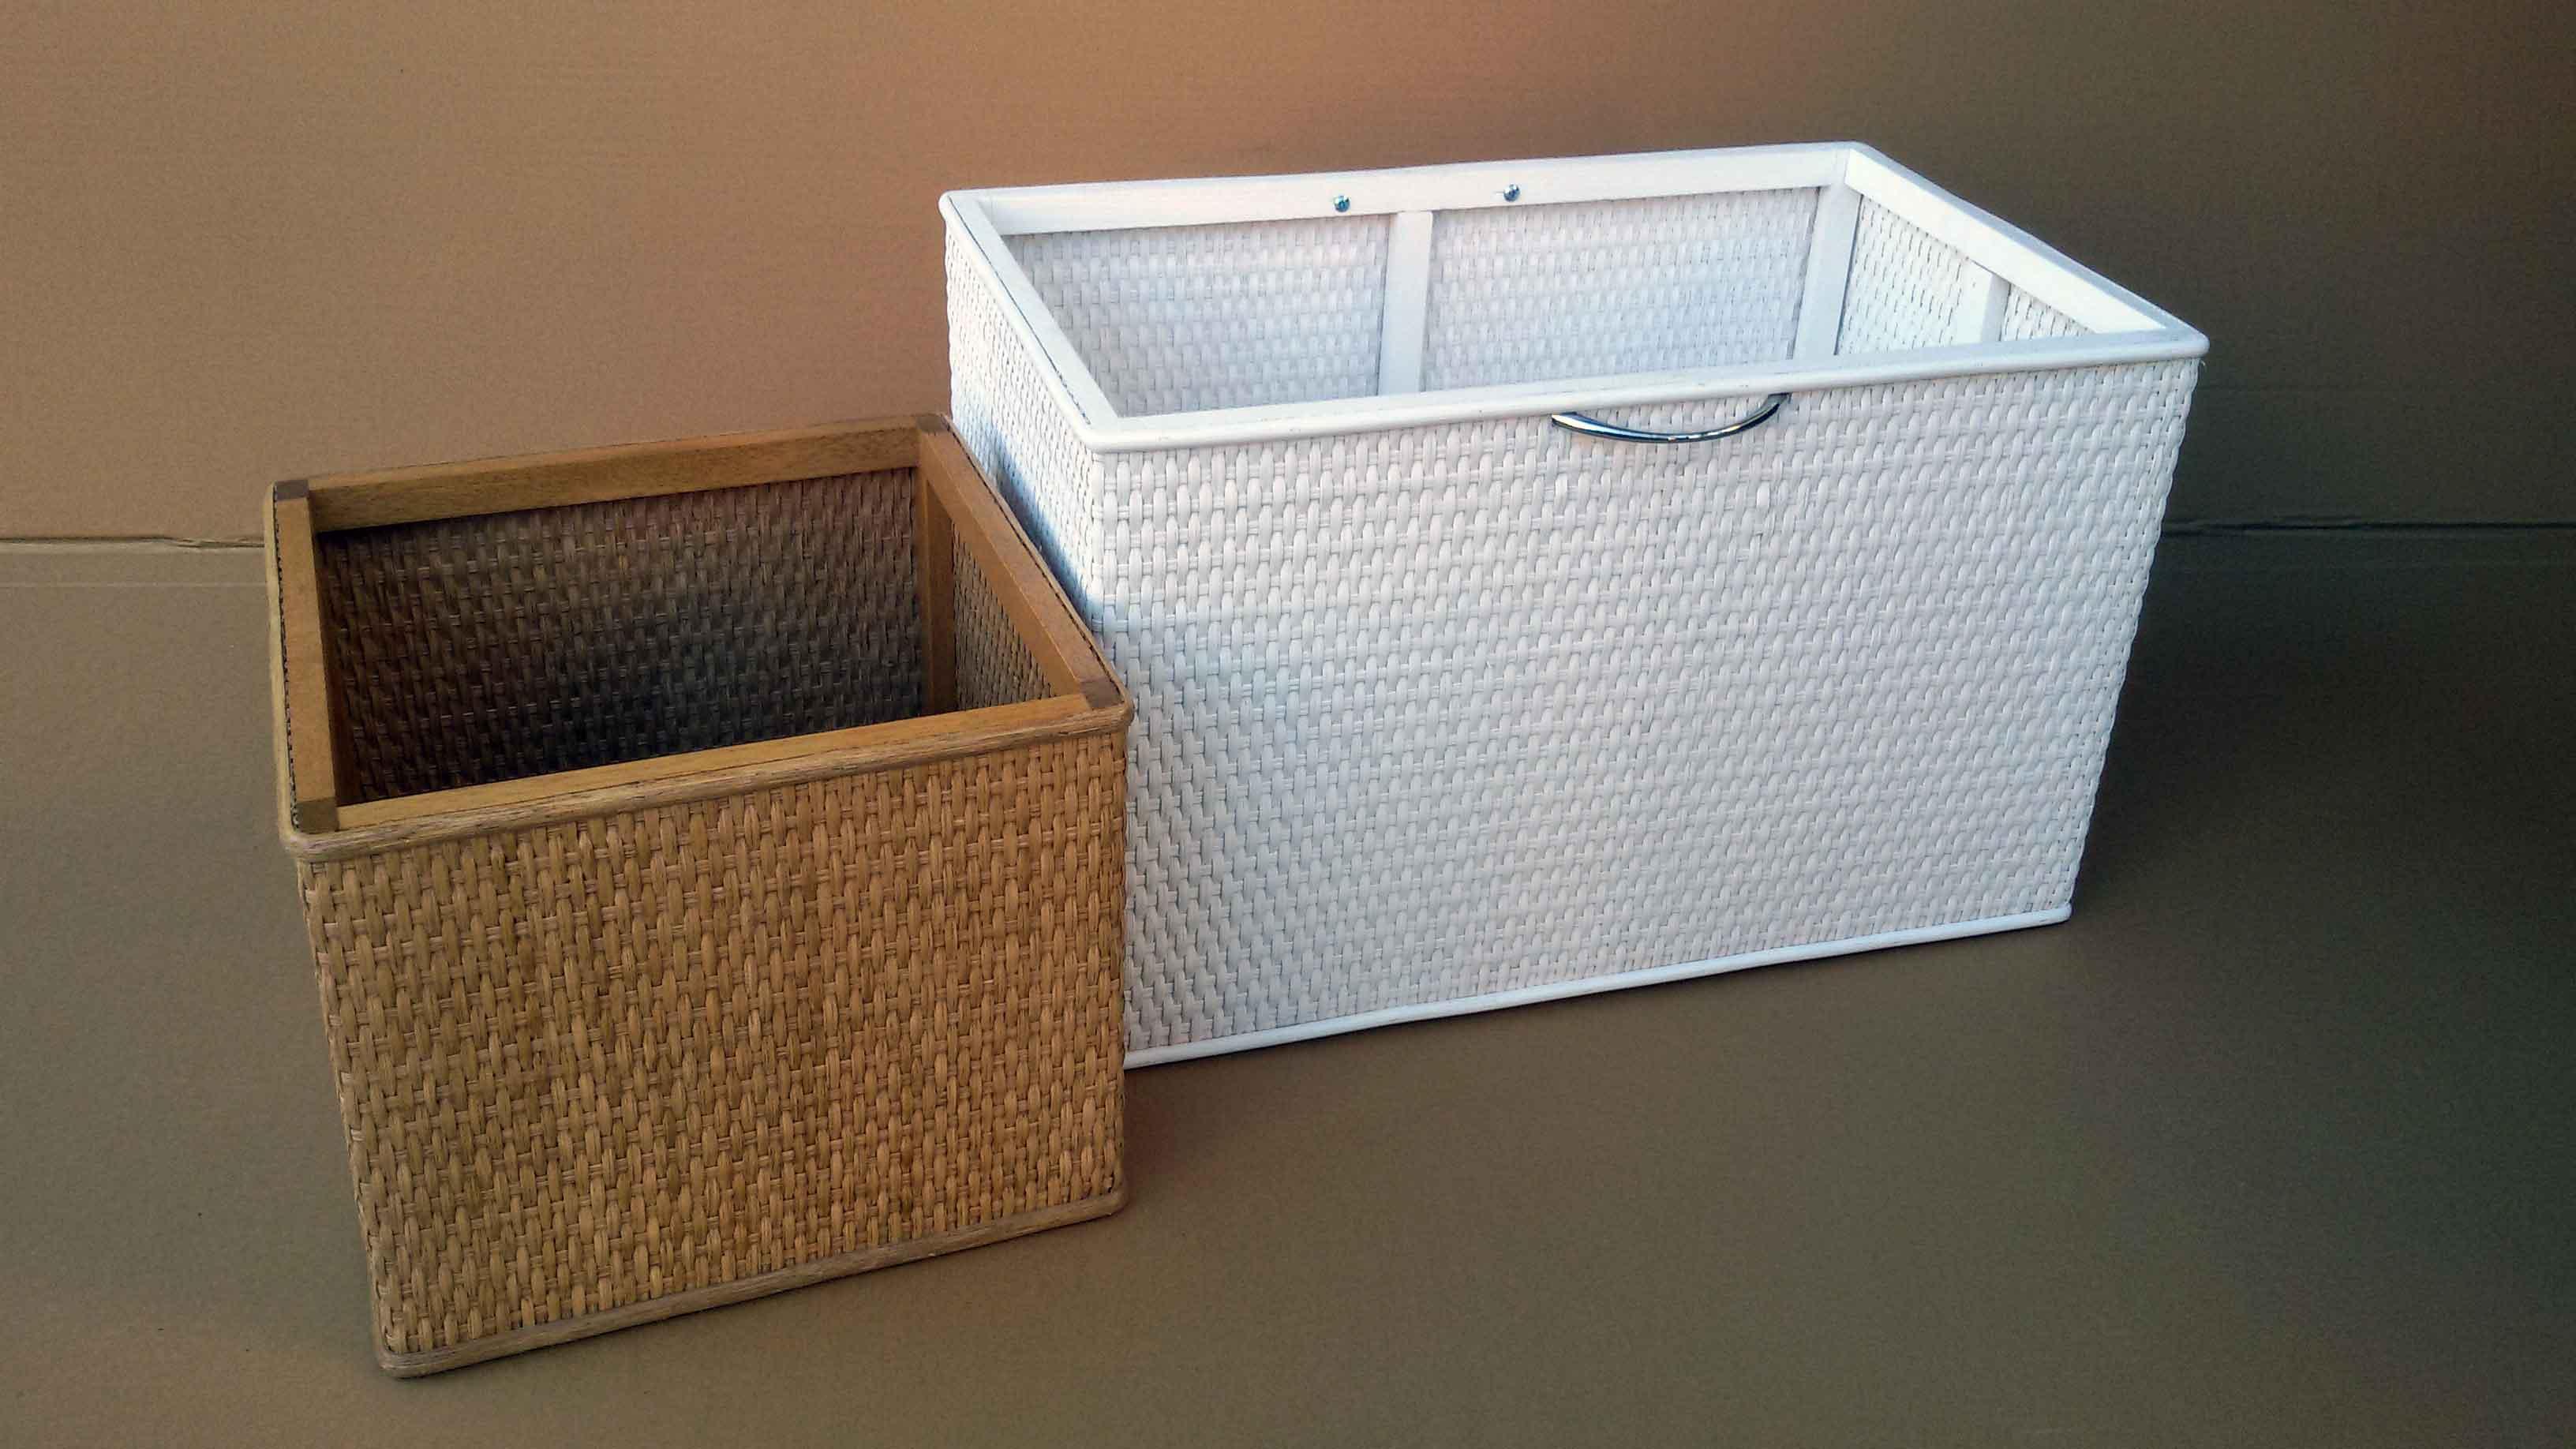 regalkorb rattan peddig wunschma rattan korbhaus. Black Bedroom Furniture Sets. Home Design Ideas